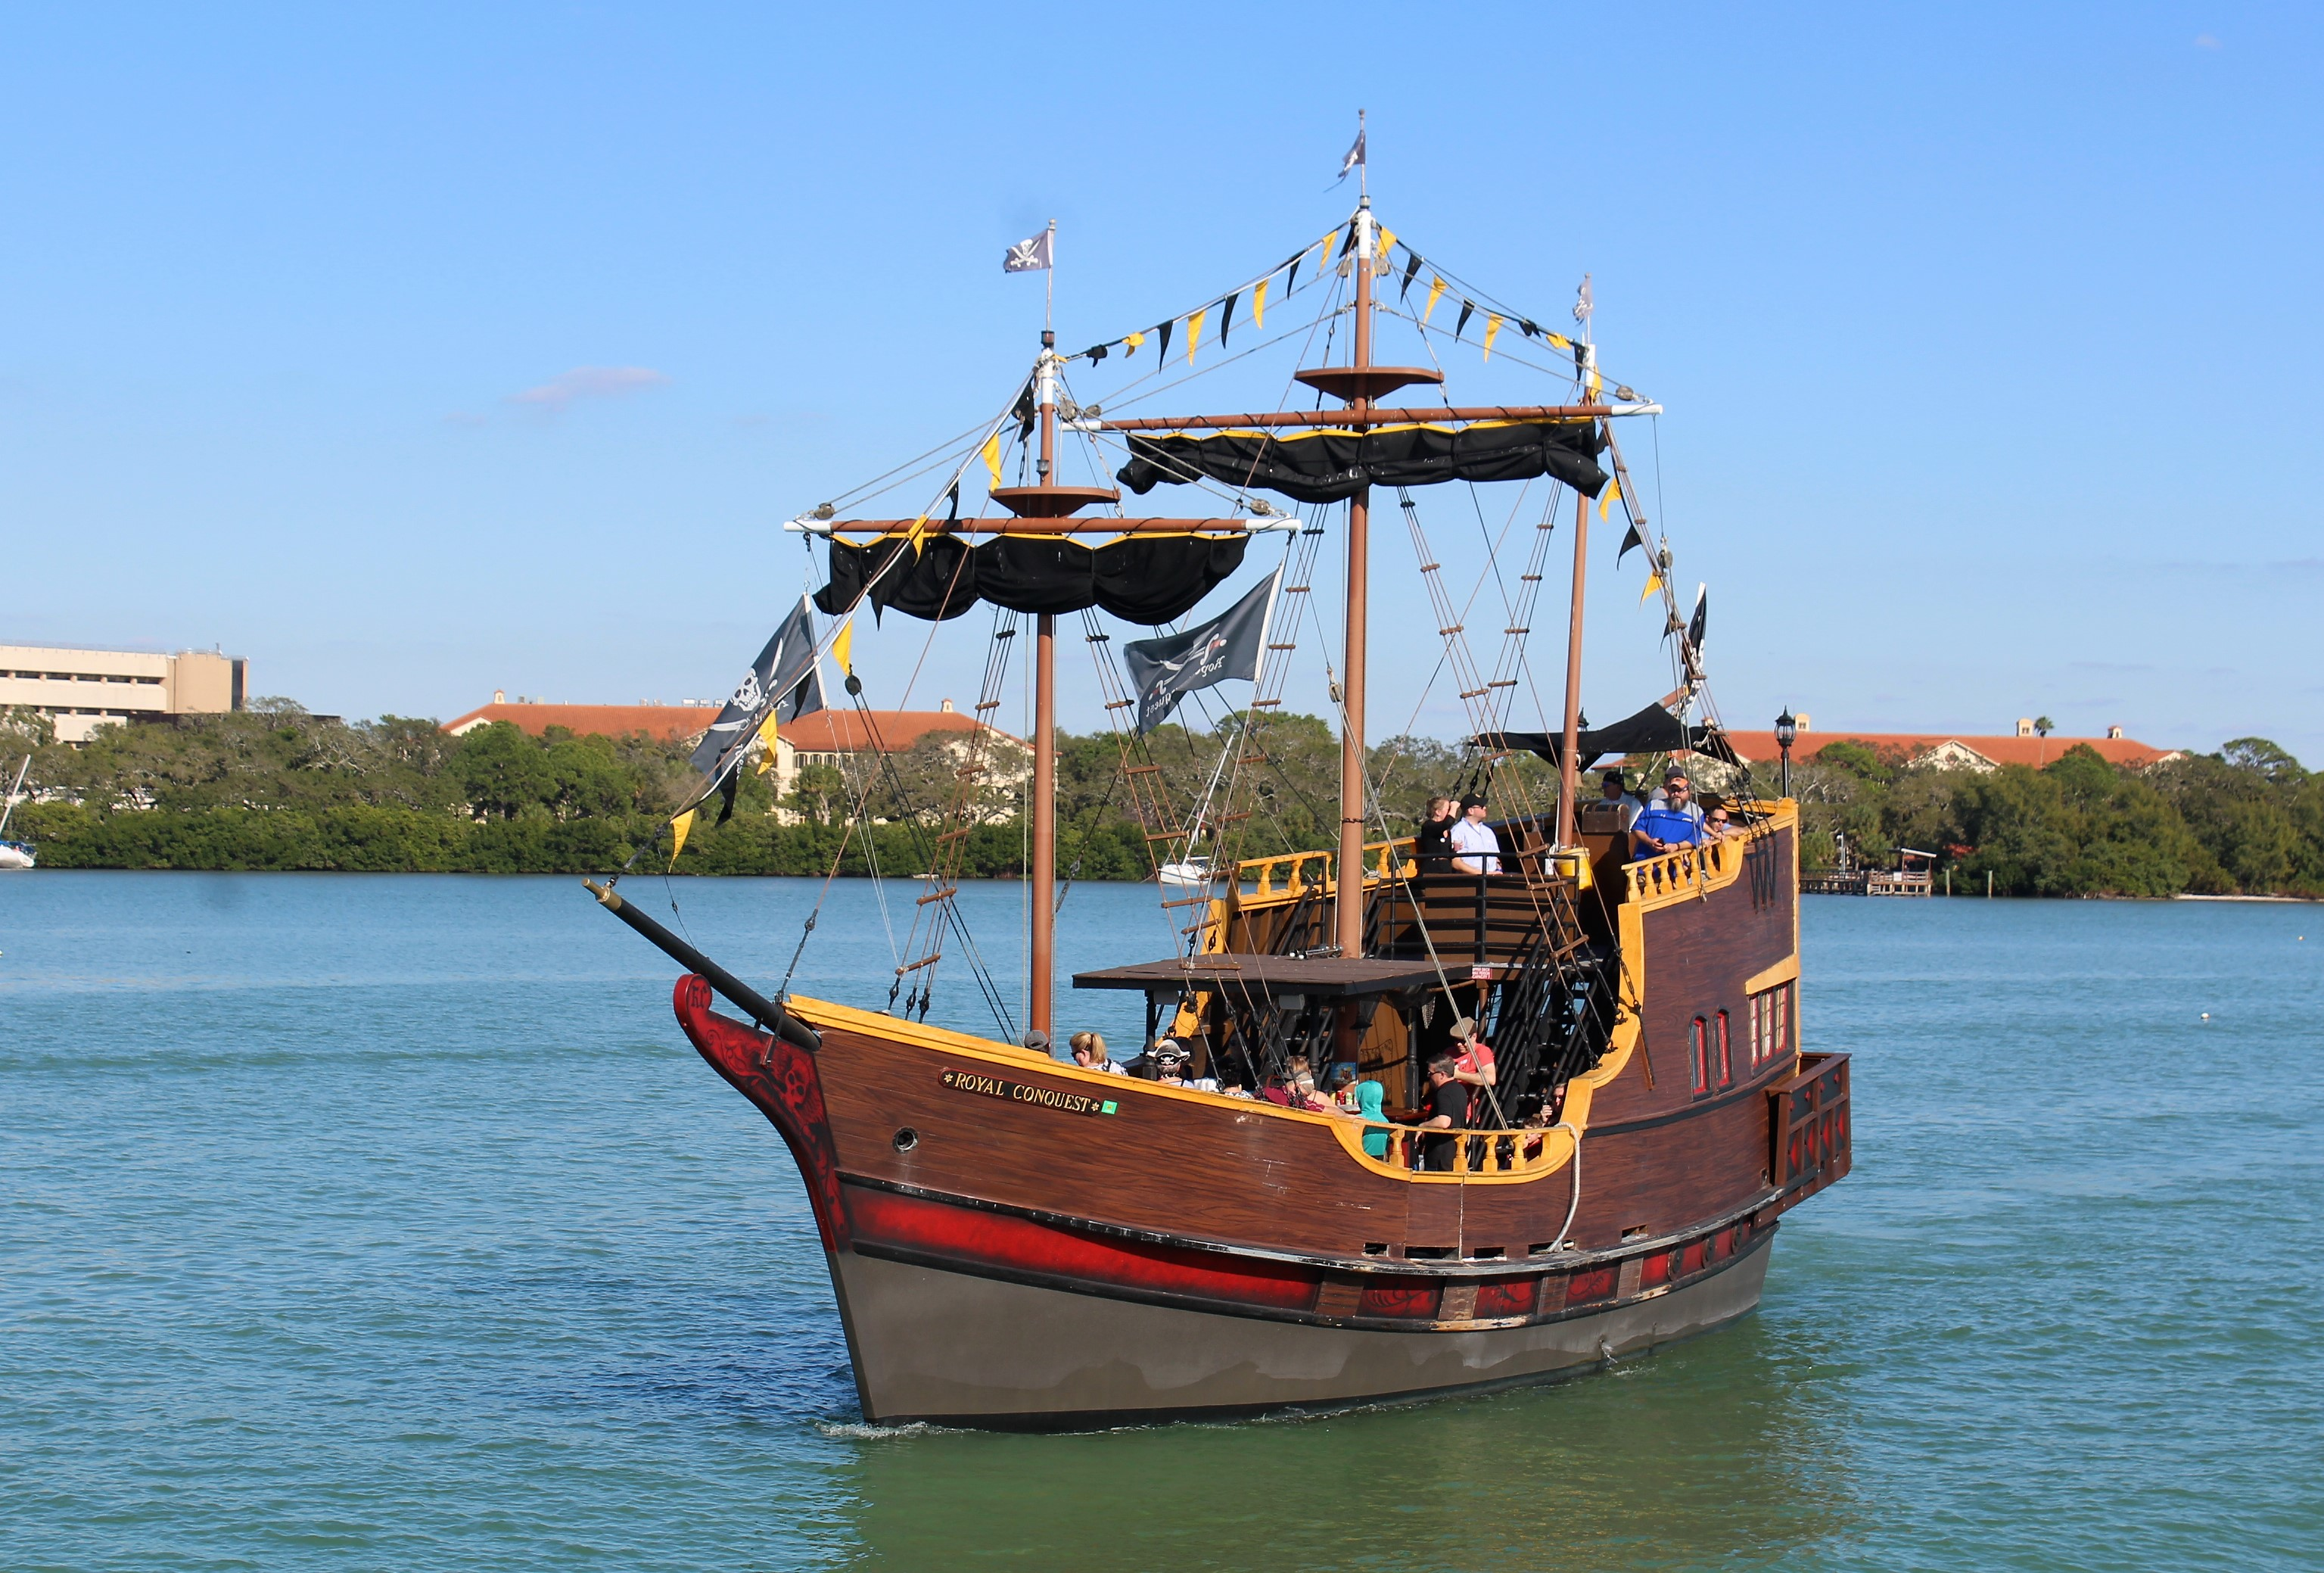 5 pirate ship